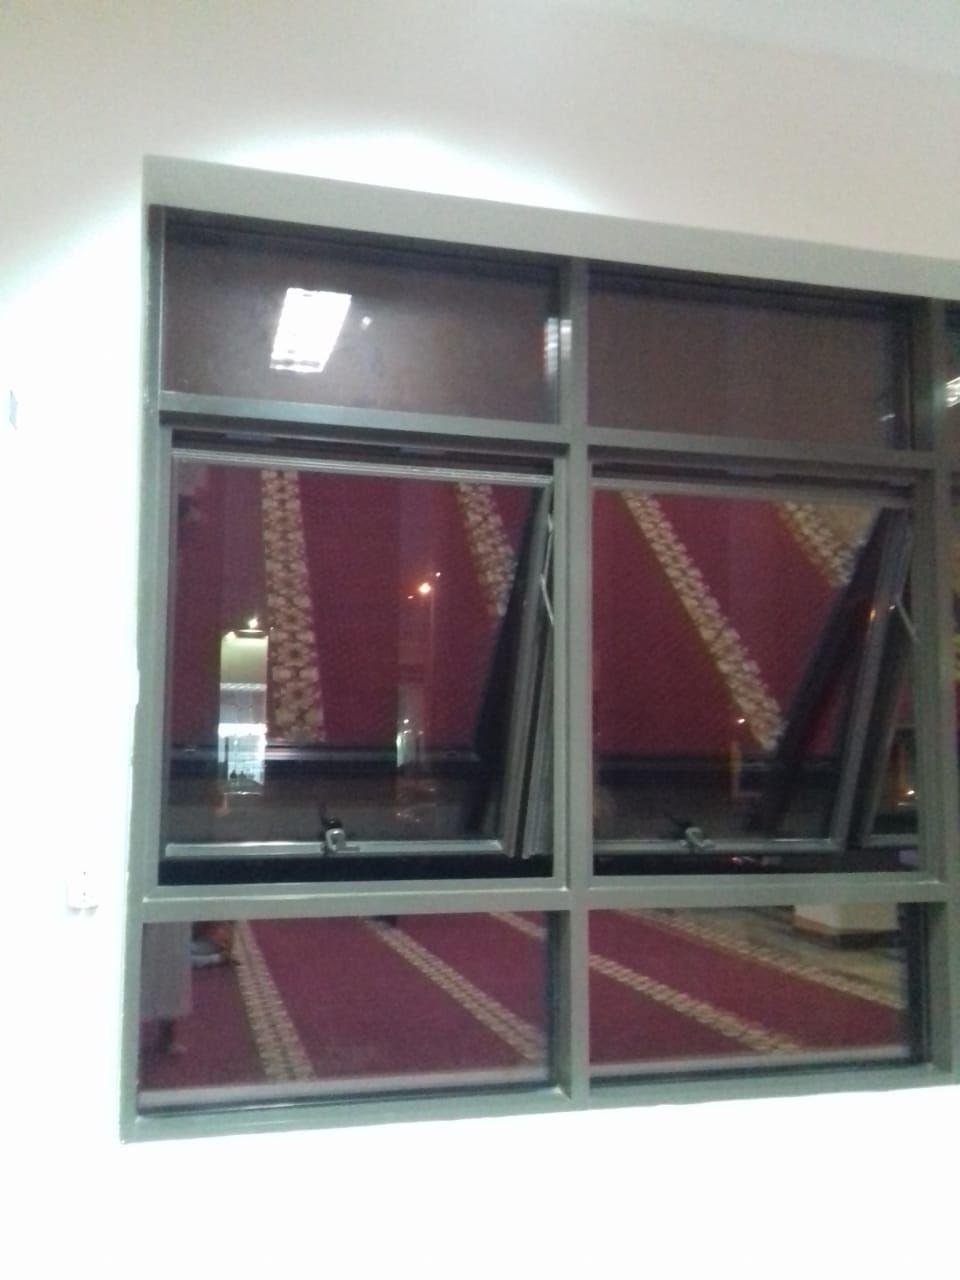 Pin By Tent Ksa On مقاولات عامة الرياض 0530608113 Home Shelves Decor